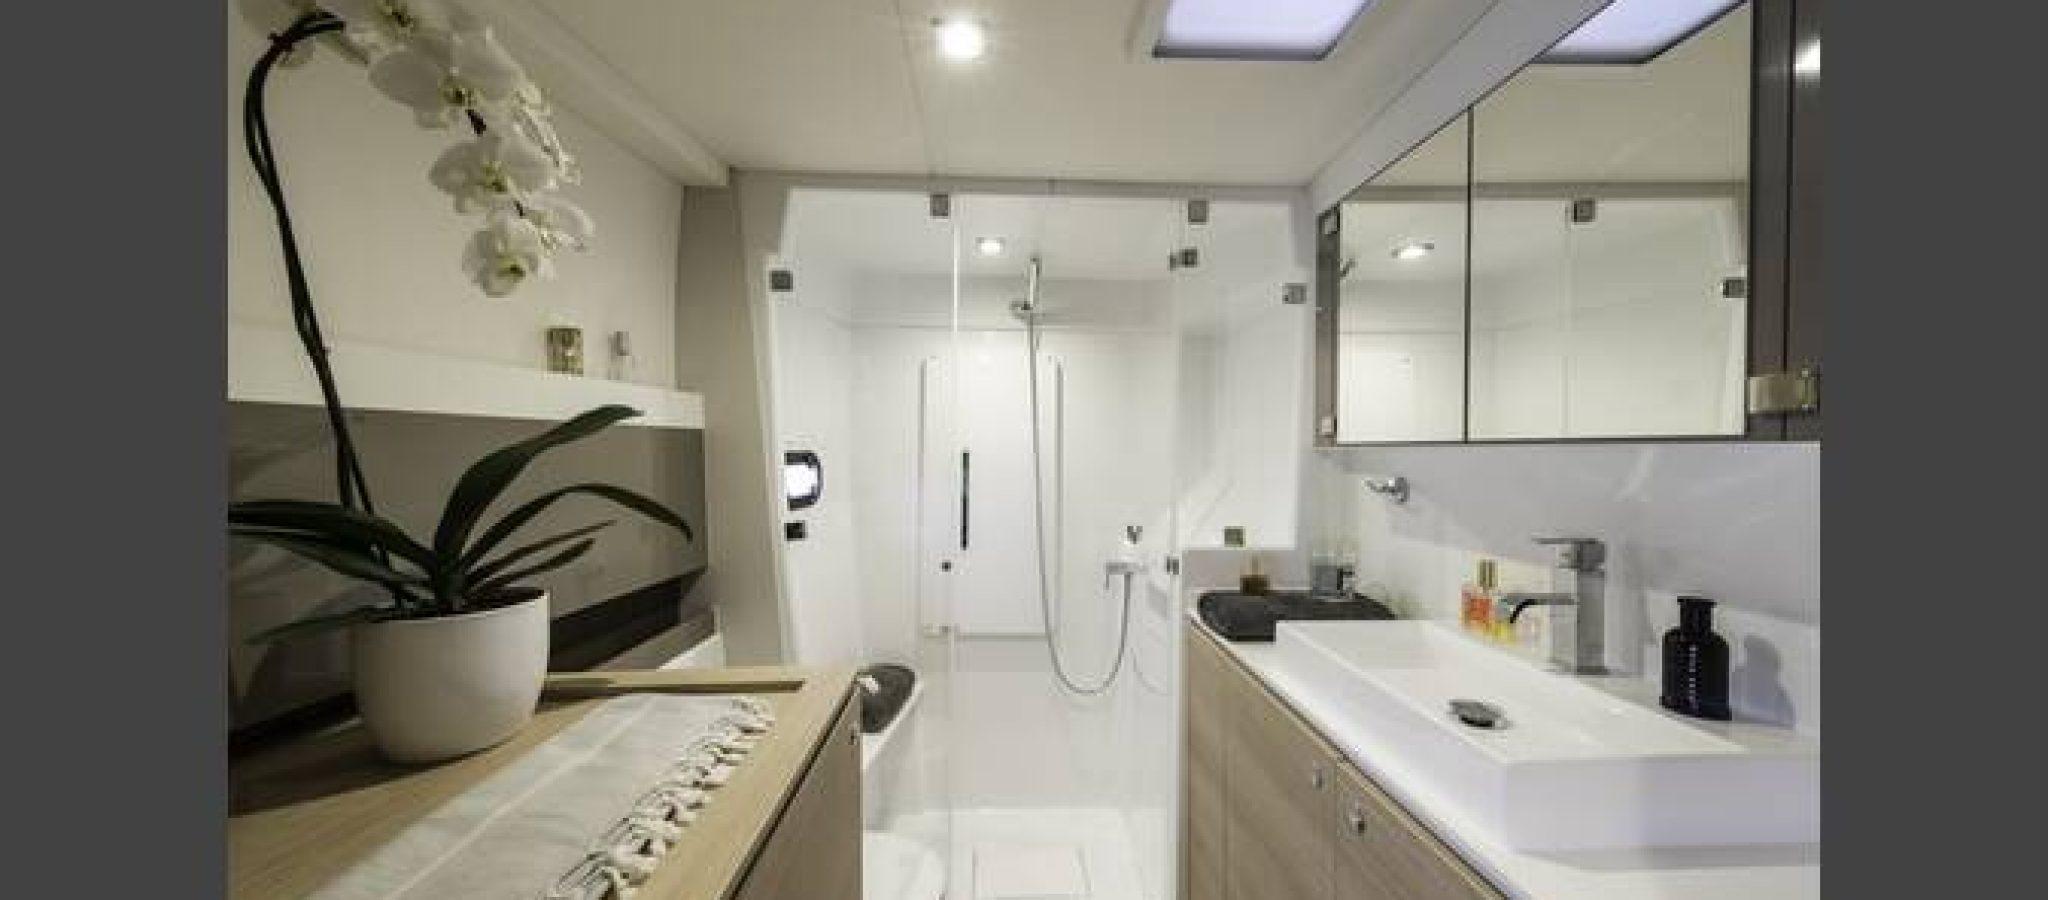 Bali 4.0 3 cabines sdb